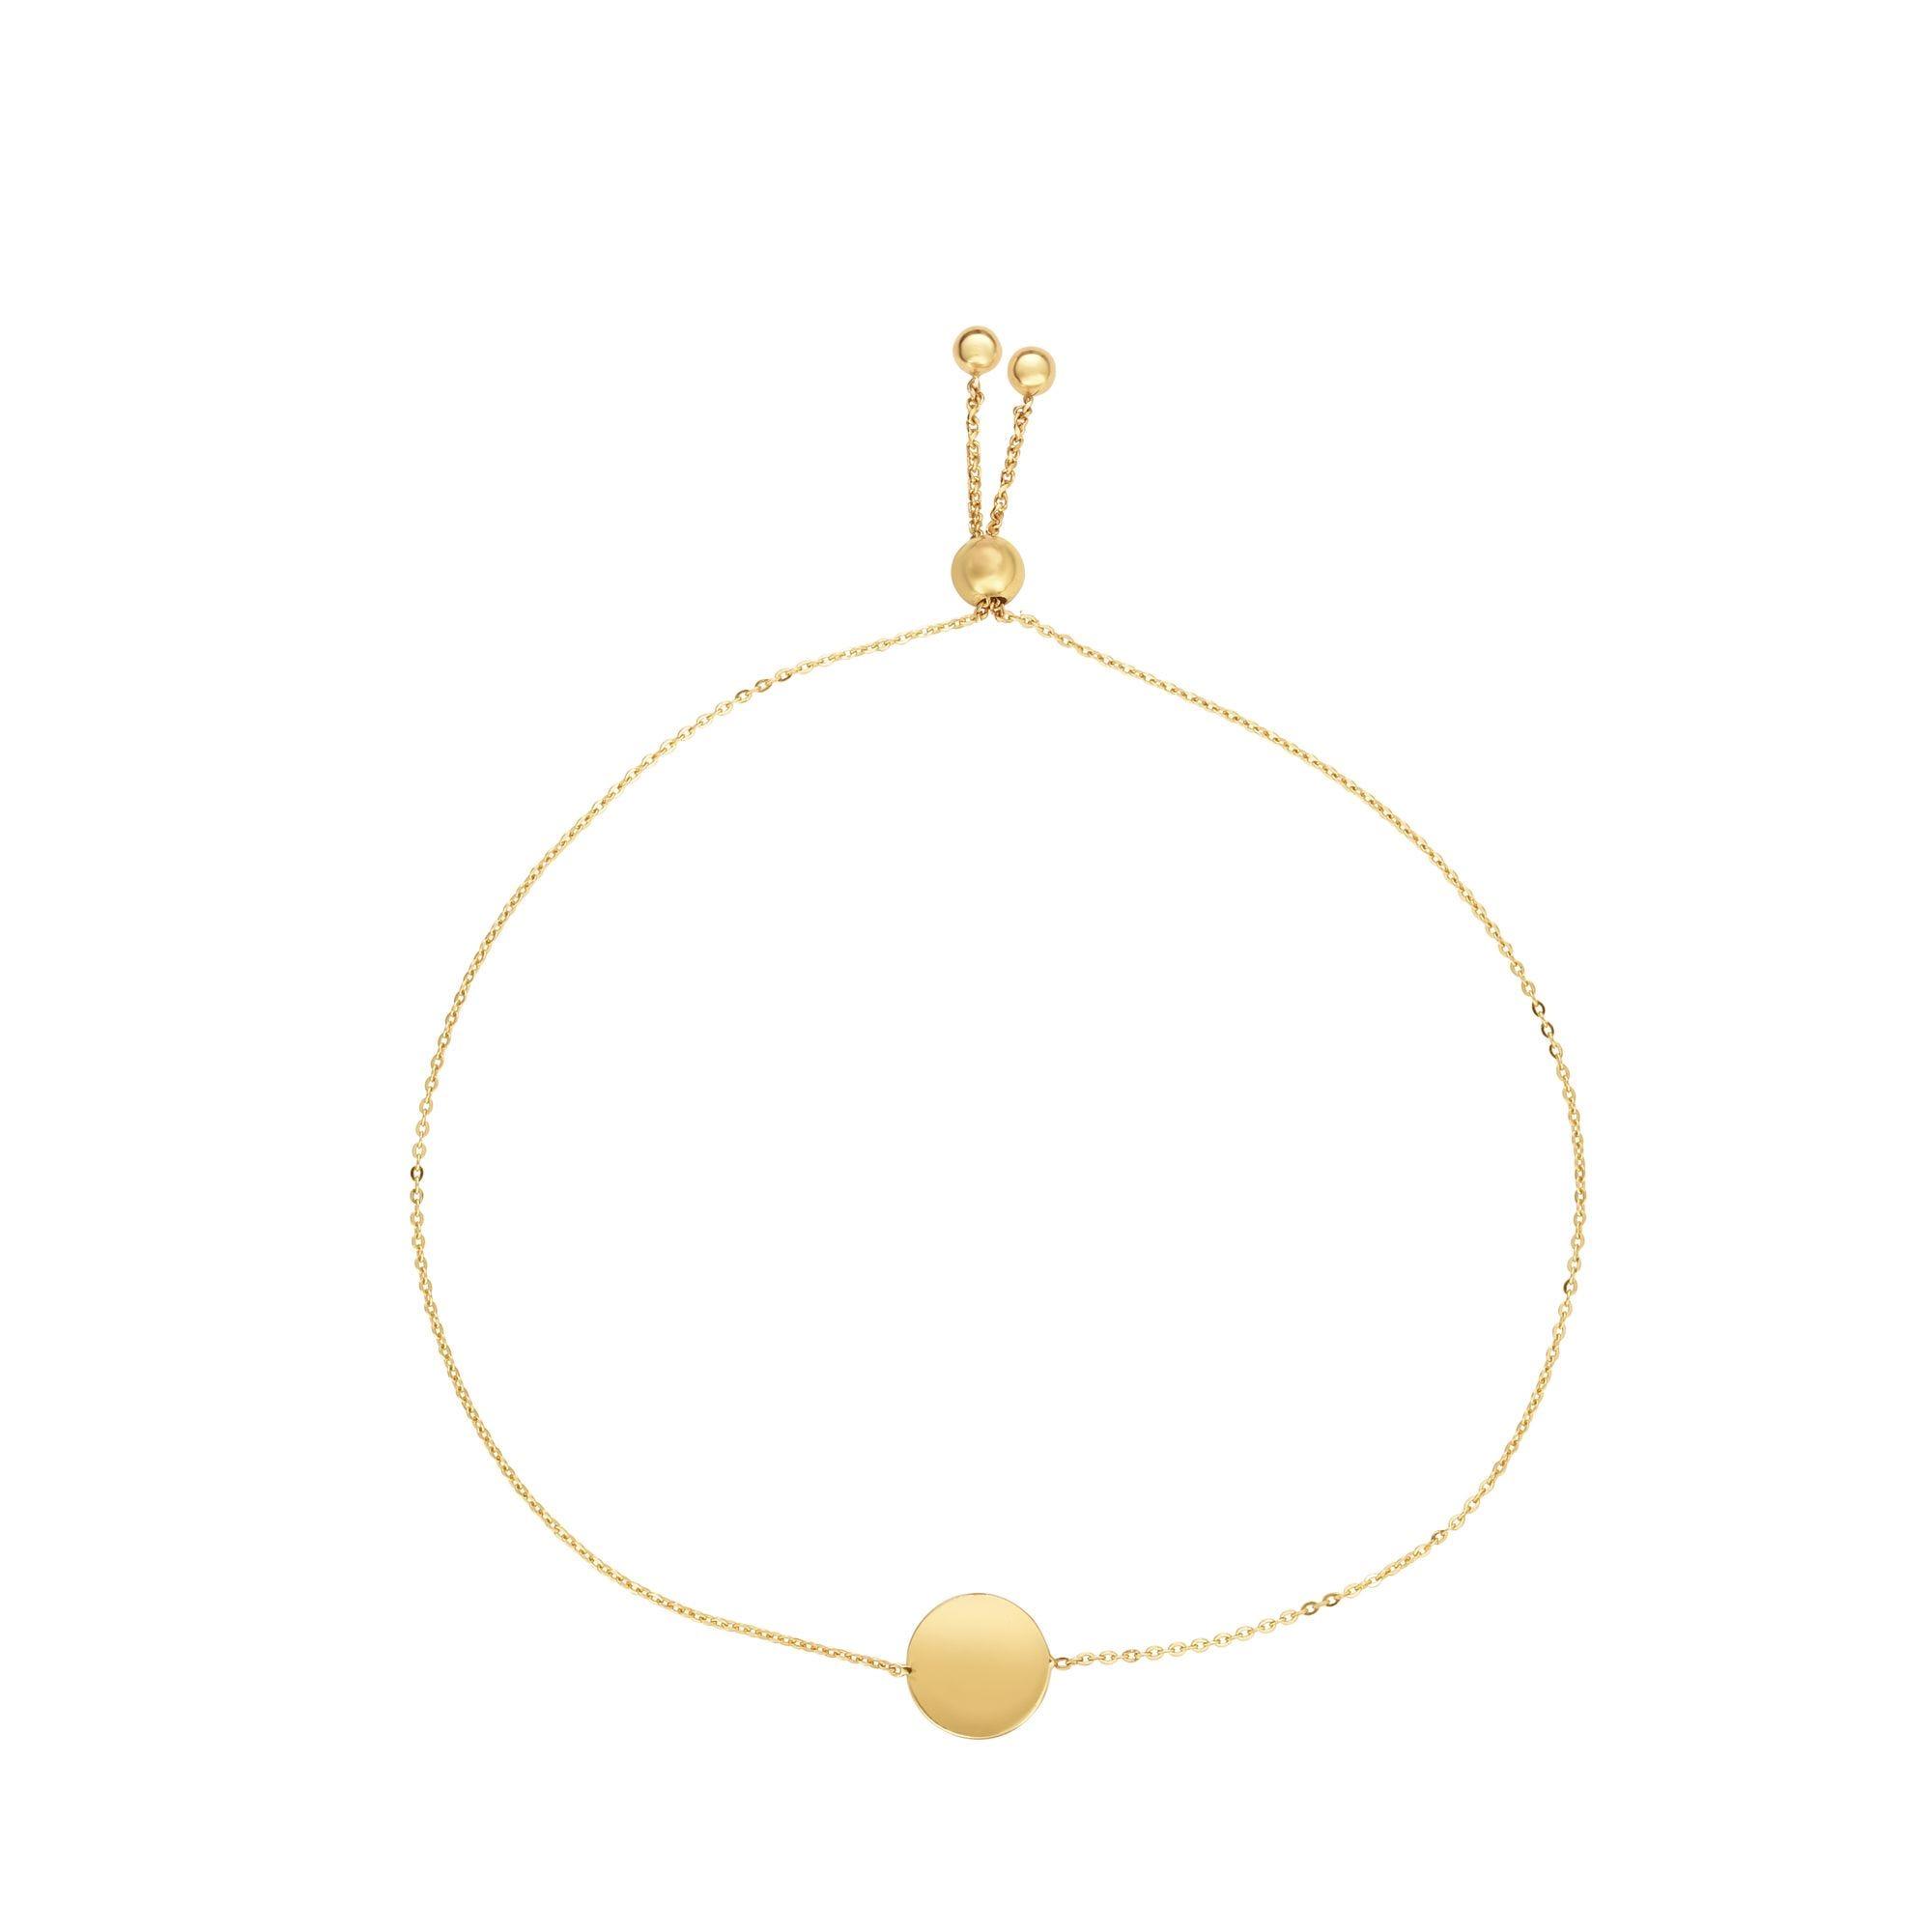 Circle Bolo Bracelet in 14k Yellow Gold